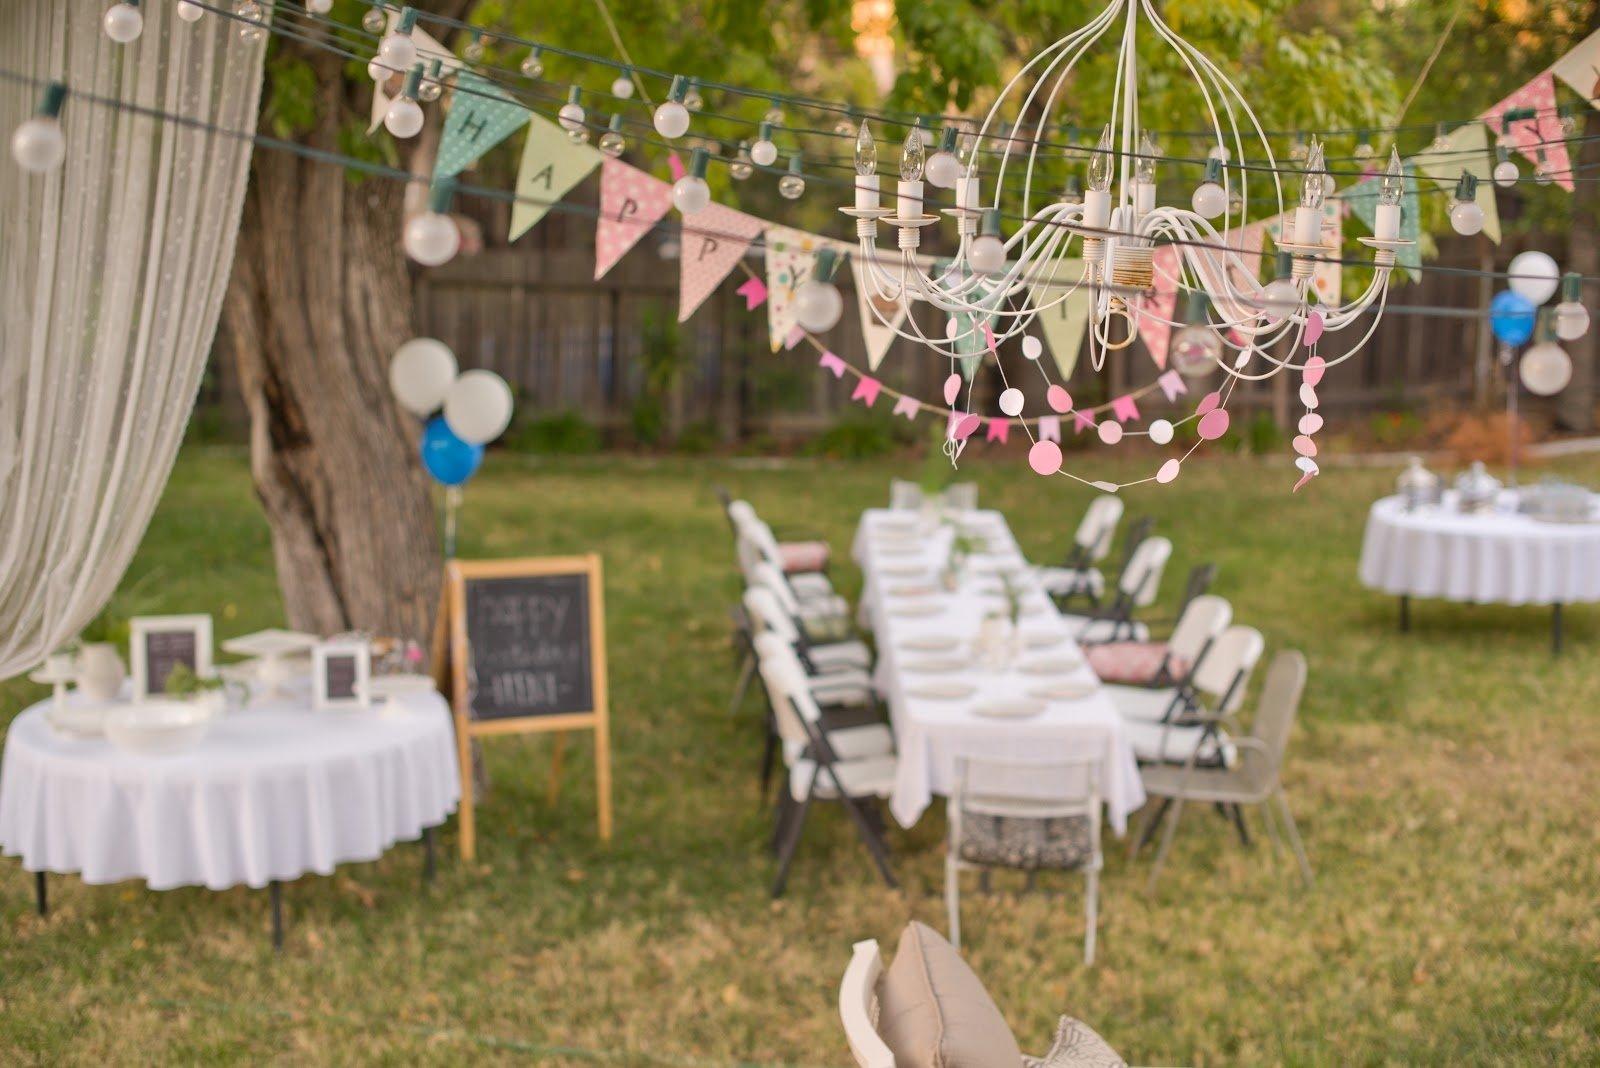 10 Stylish Backyard Birthday Party Ideas For Adults backyard birthday party ideas amazing with photo of backyard